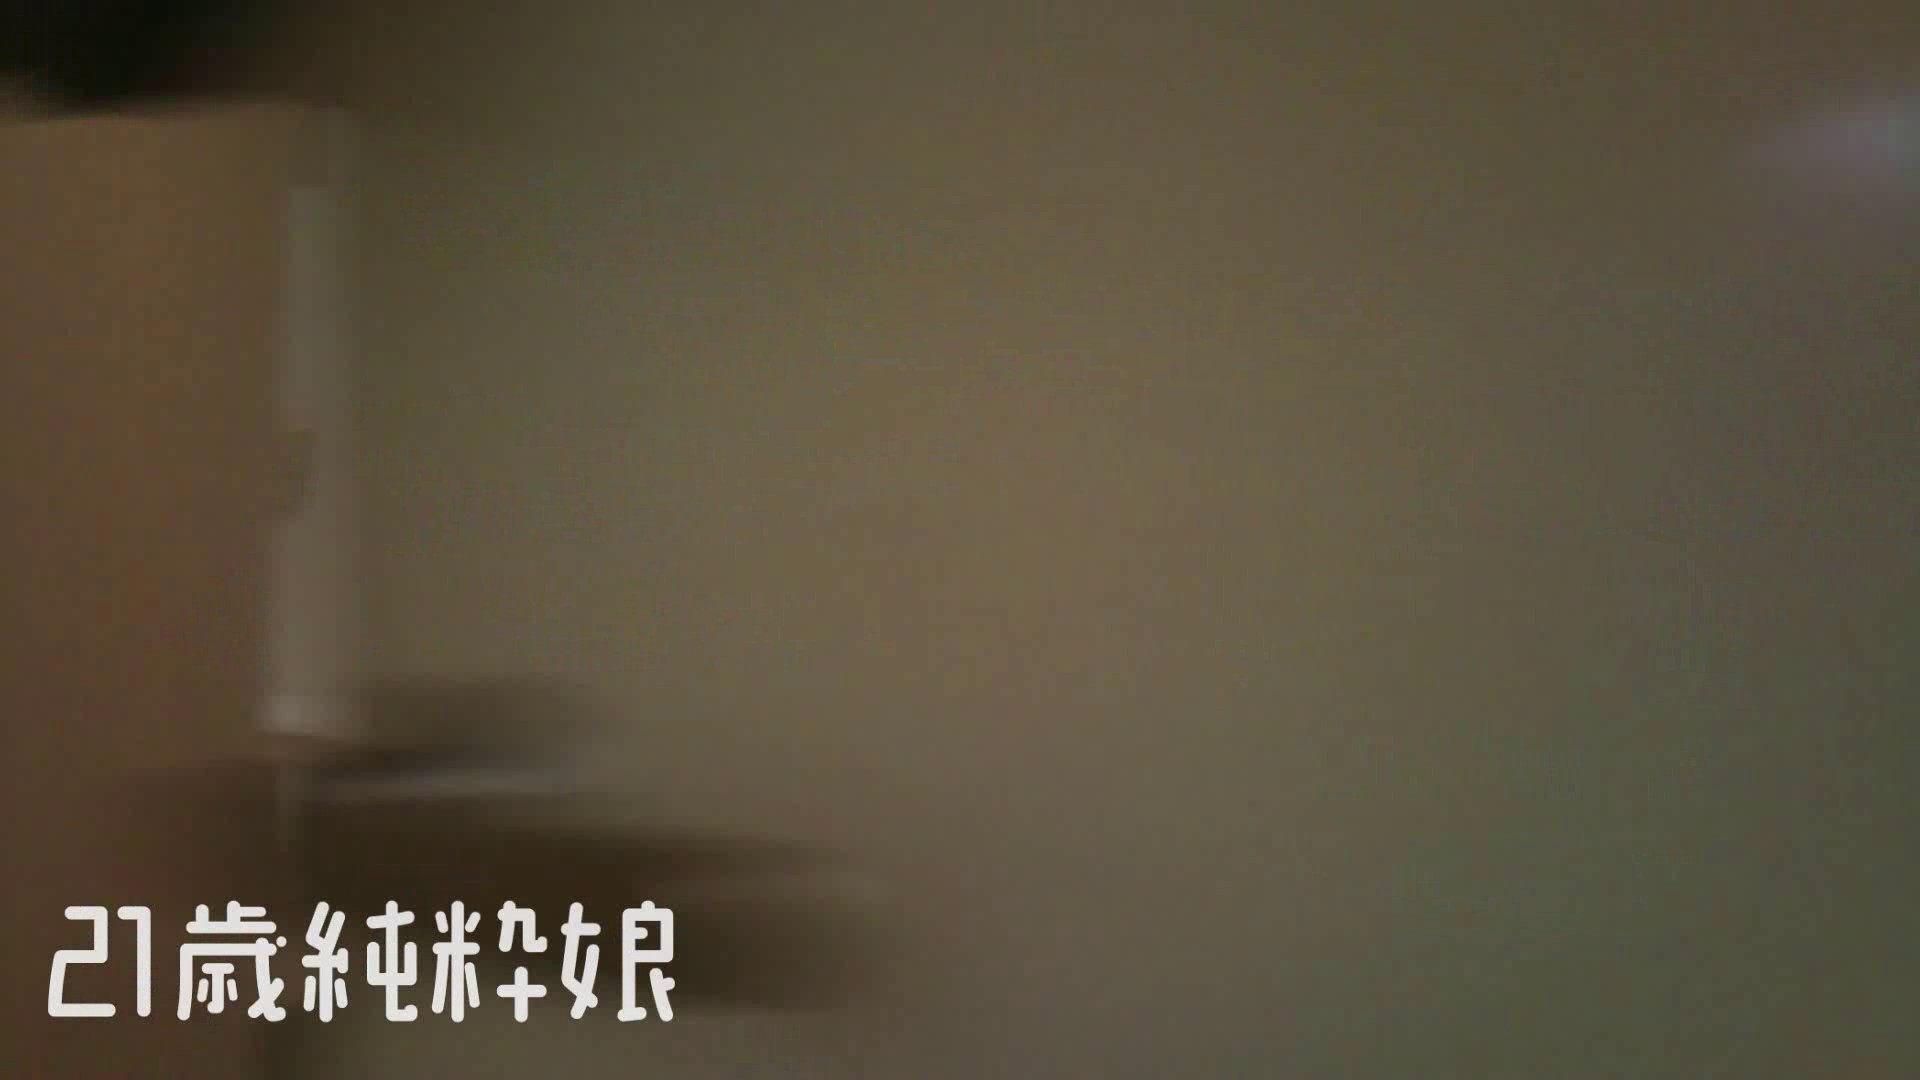 Gカップ21歳純粋嬢第2弾Vol.5 美女OL  78連発 10